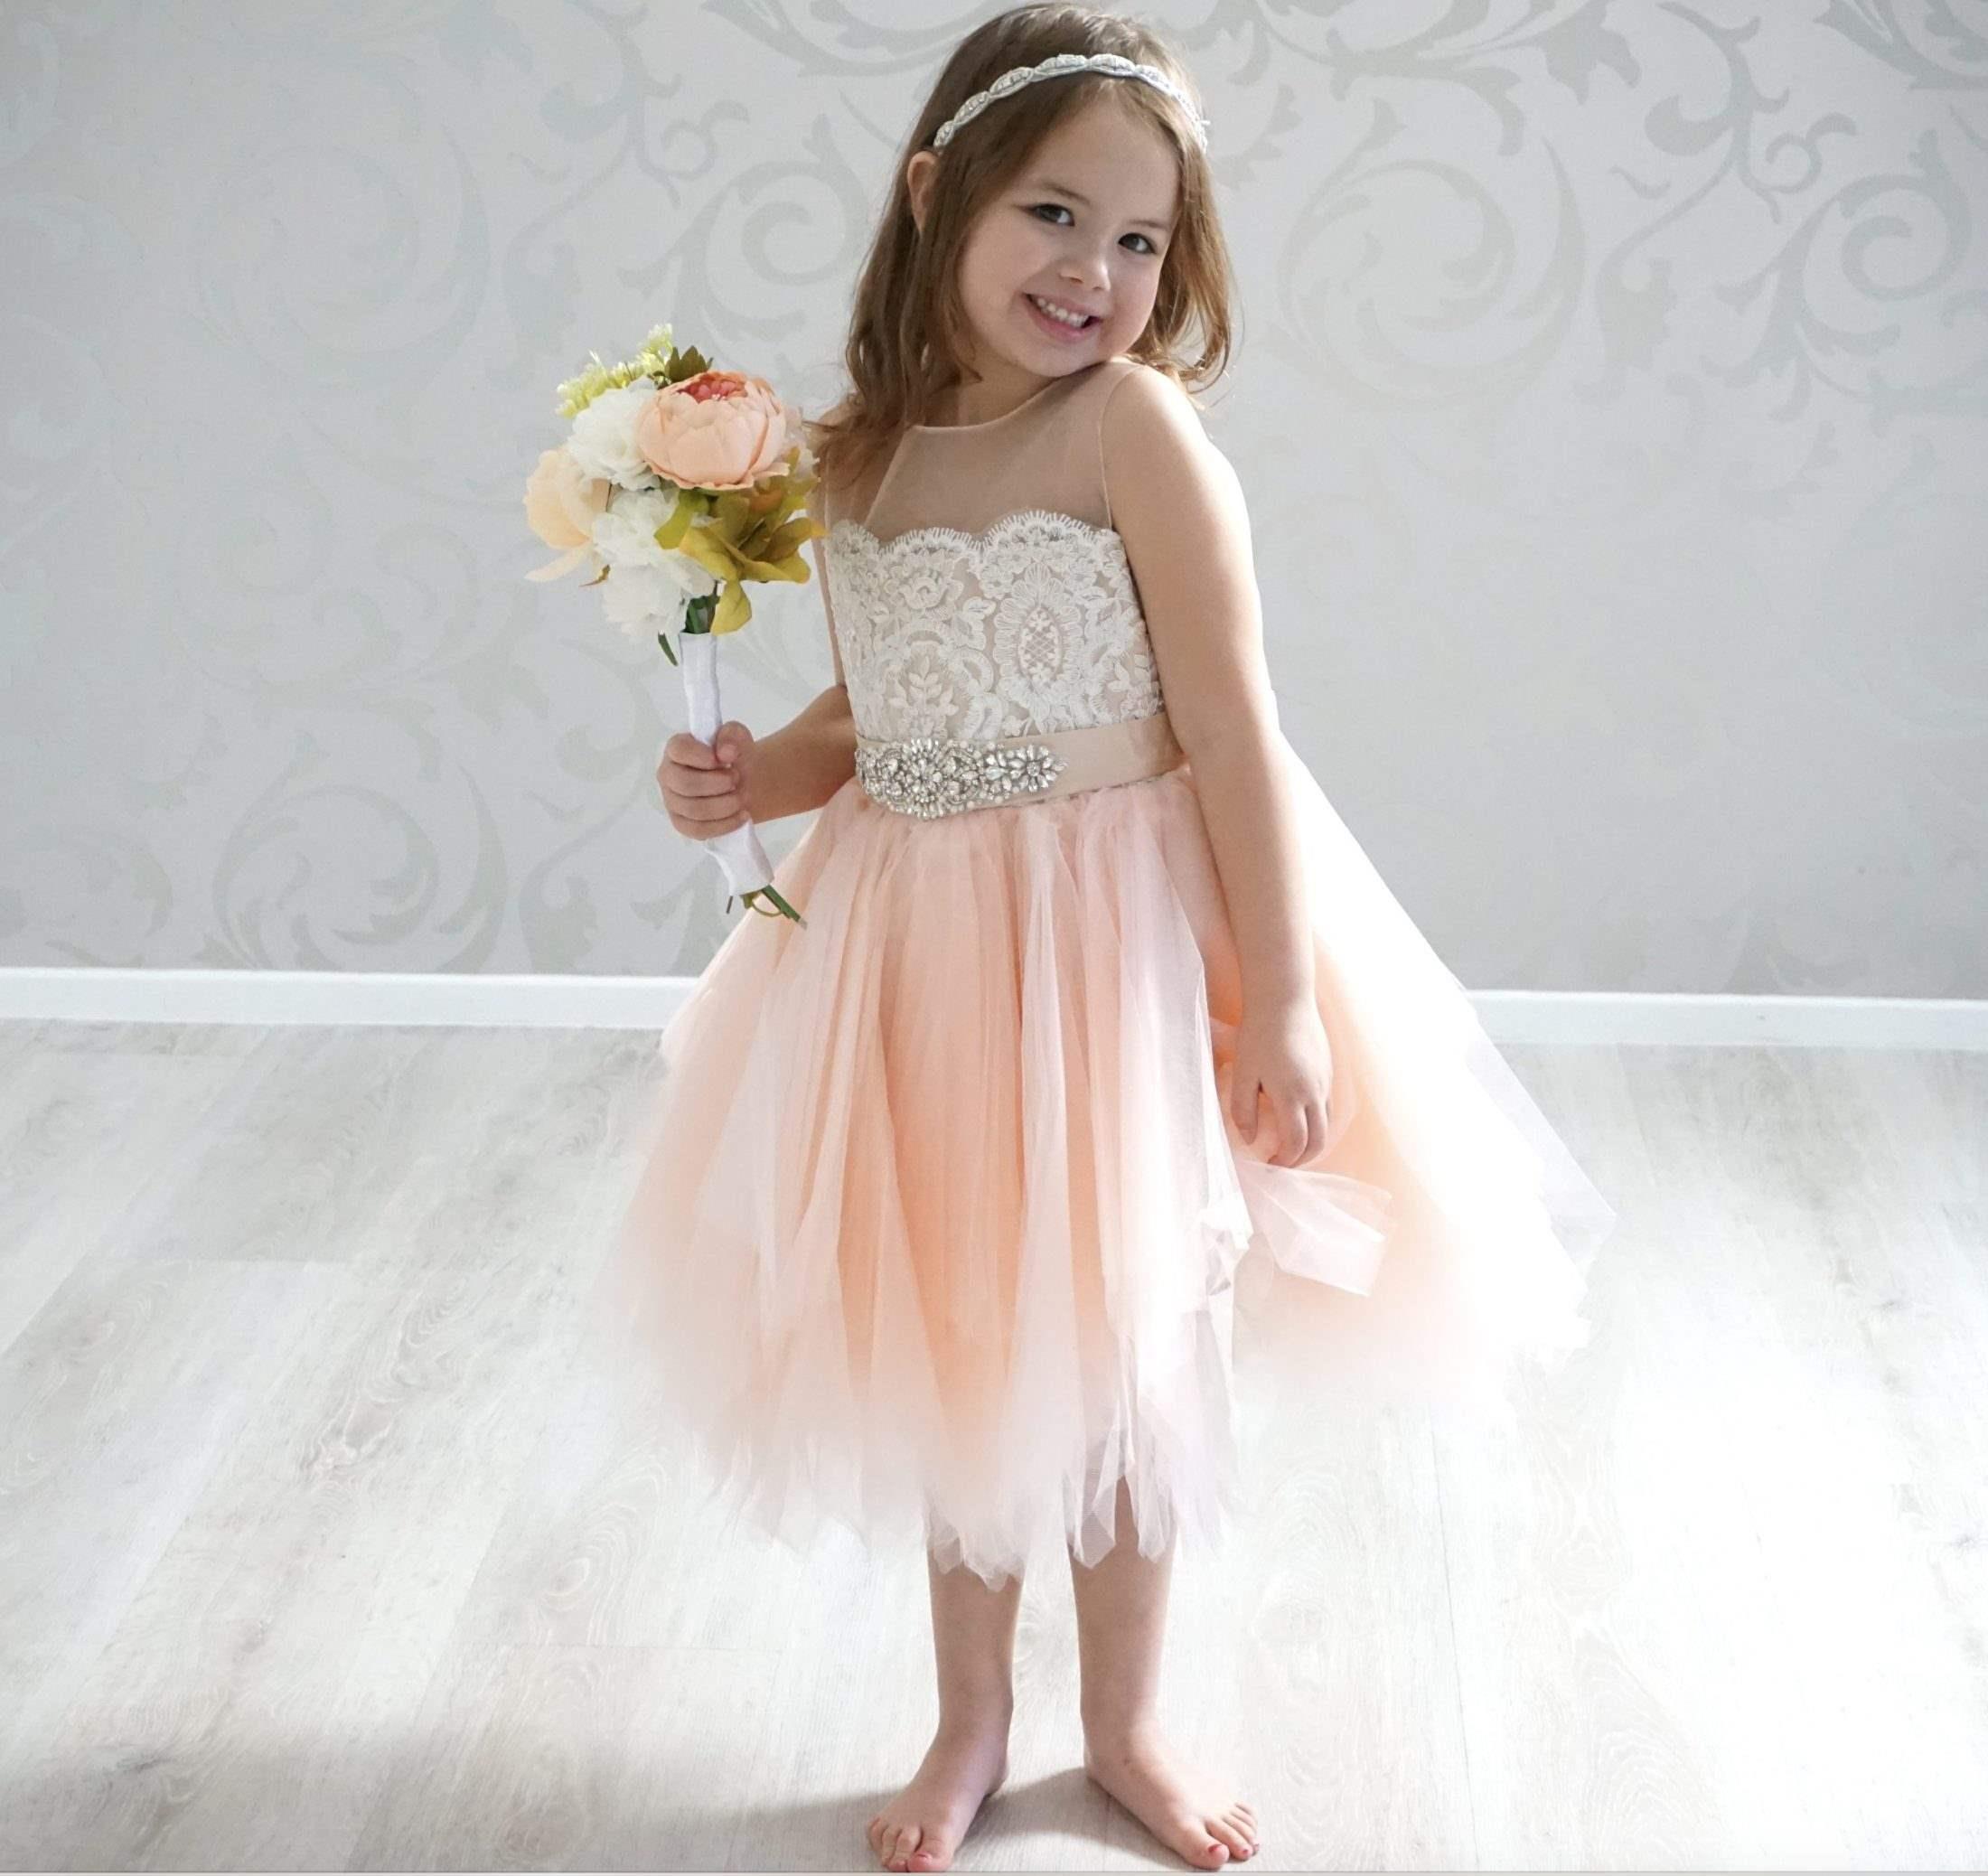 11c8a45ed3a0a Crowned Princess Dress {Blush} - Coco Blush Boutique - Where little ...